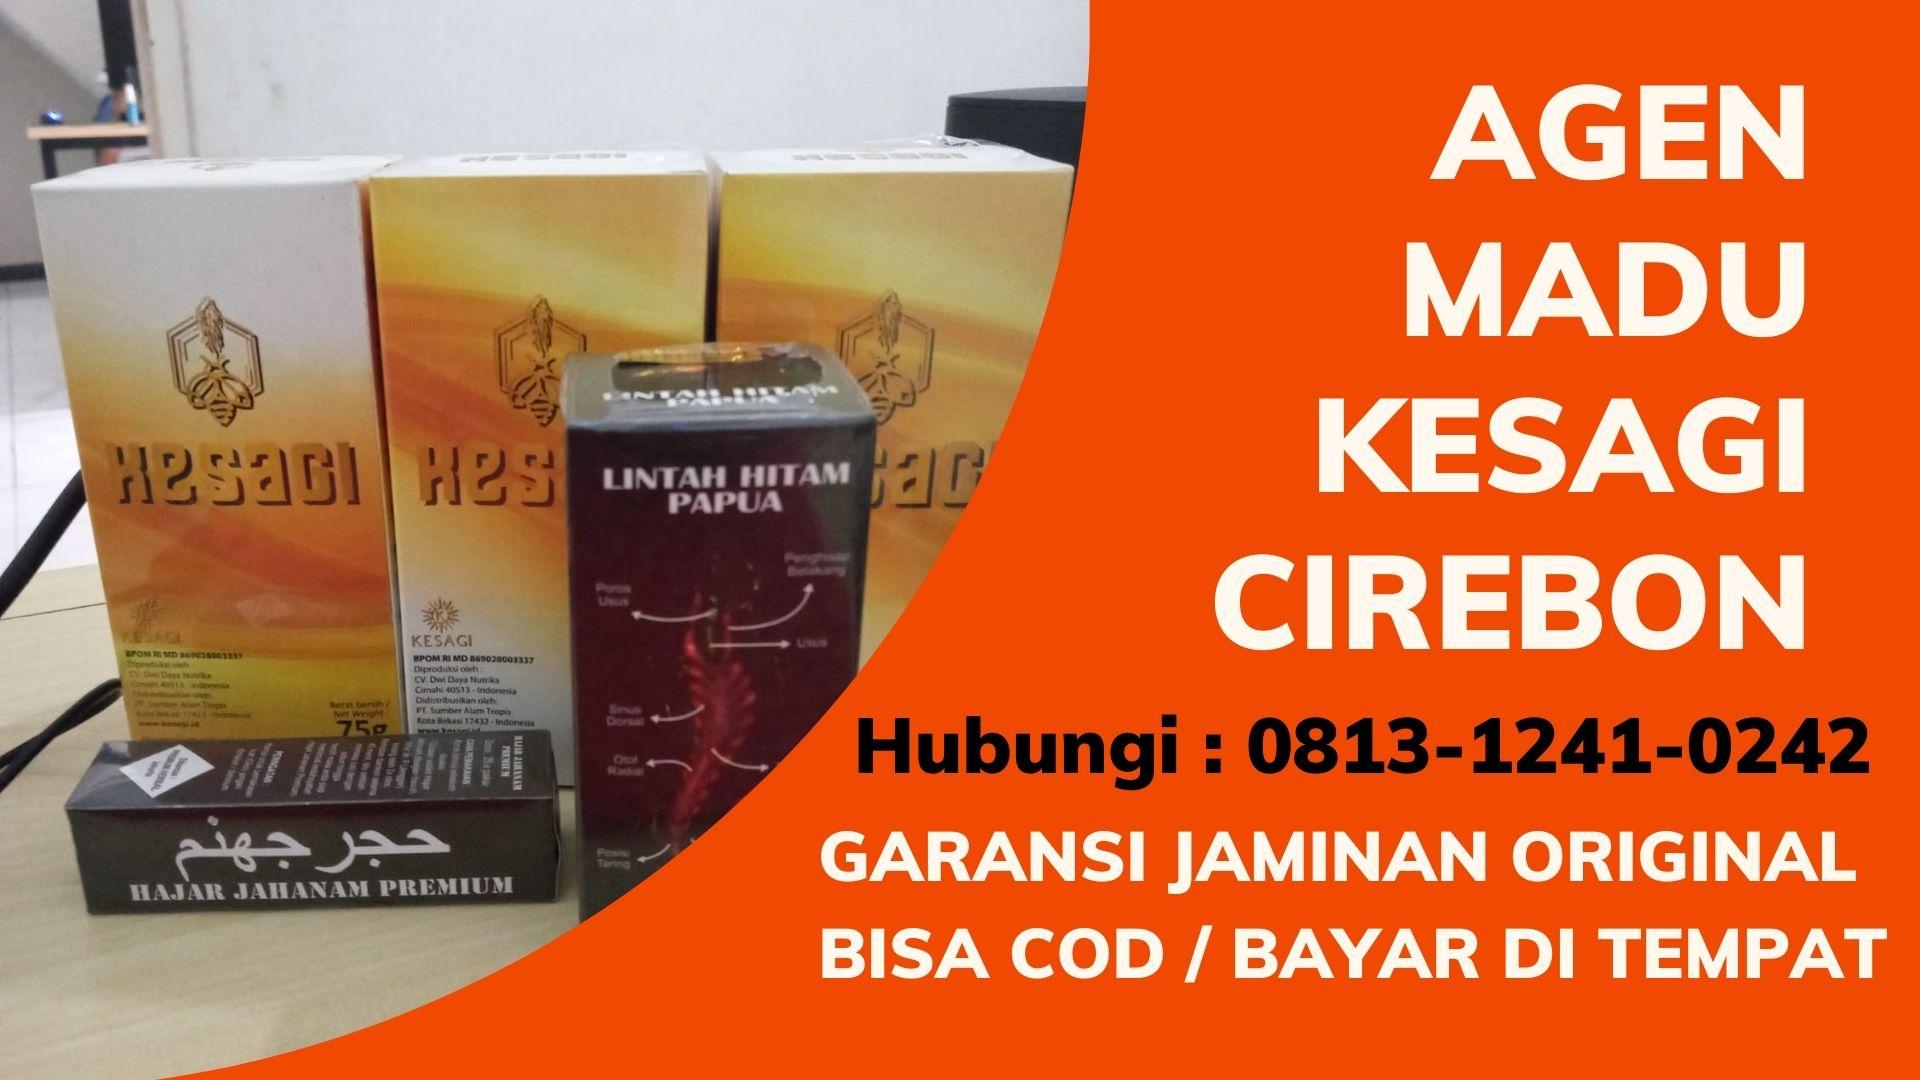 Agen Madu Kesagi Cirebon, Hub:0813-1241-0242 Resmi(COD)